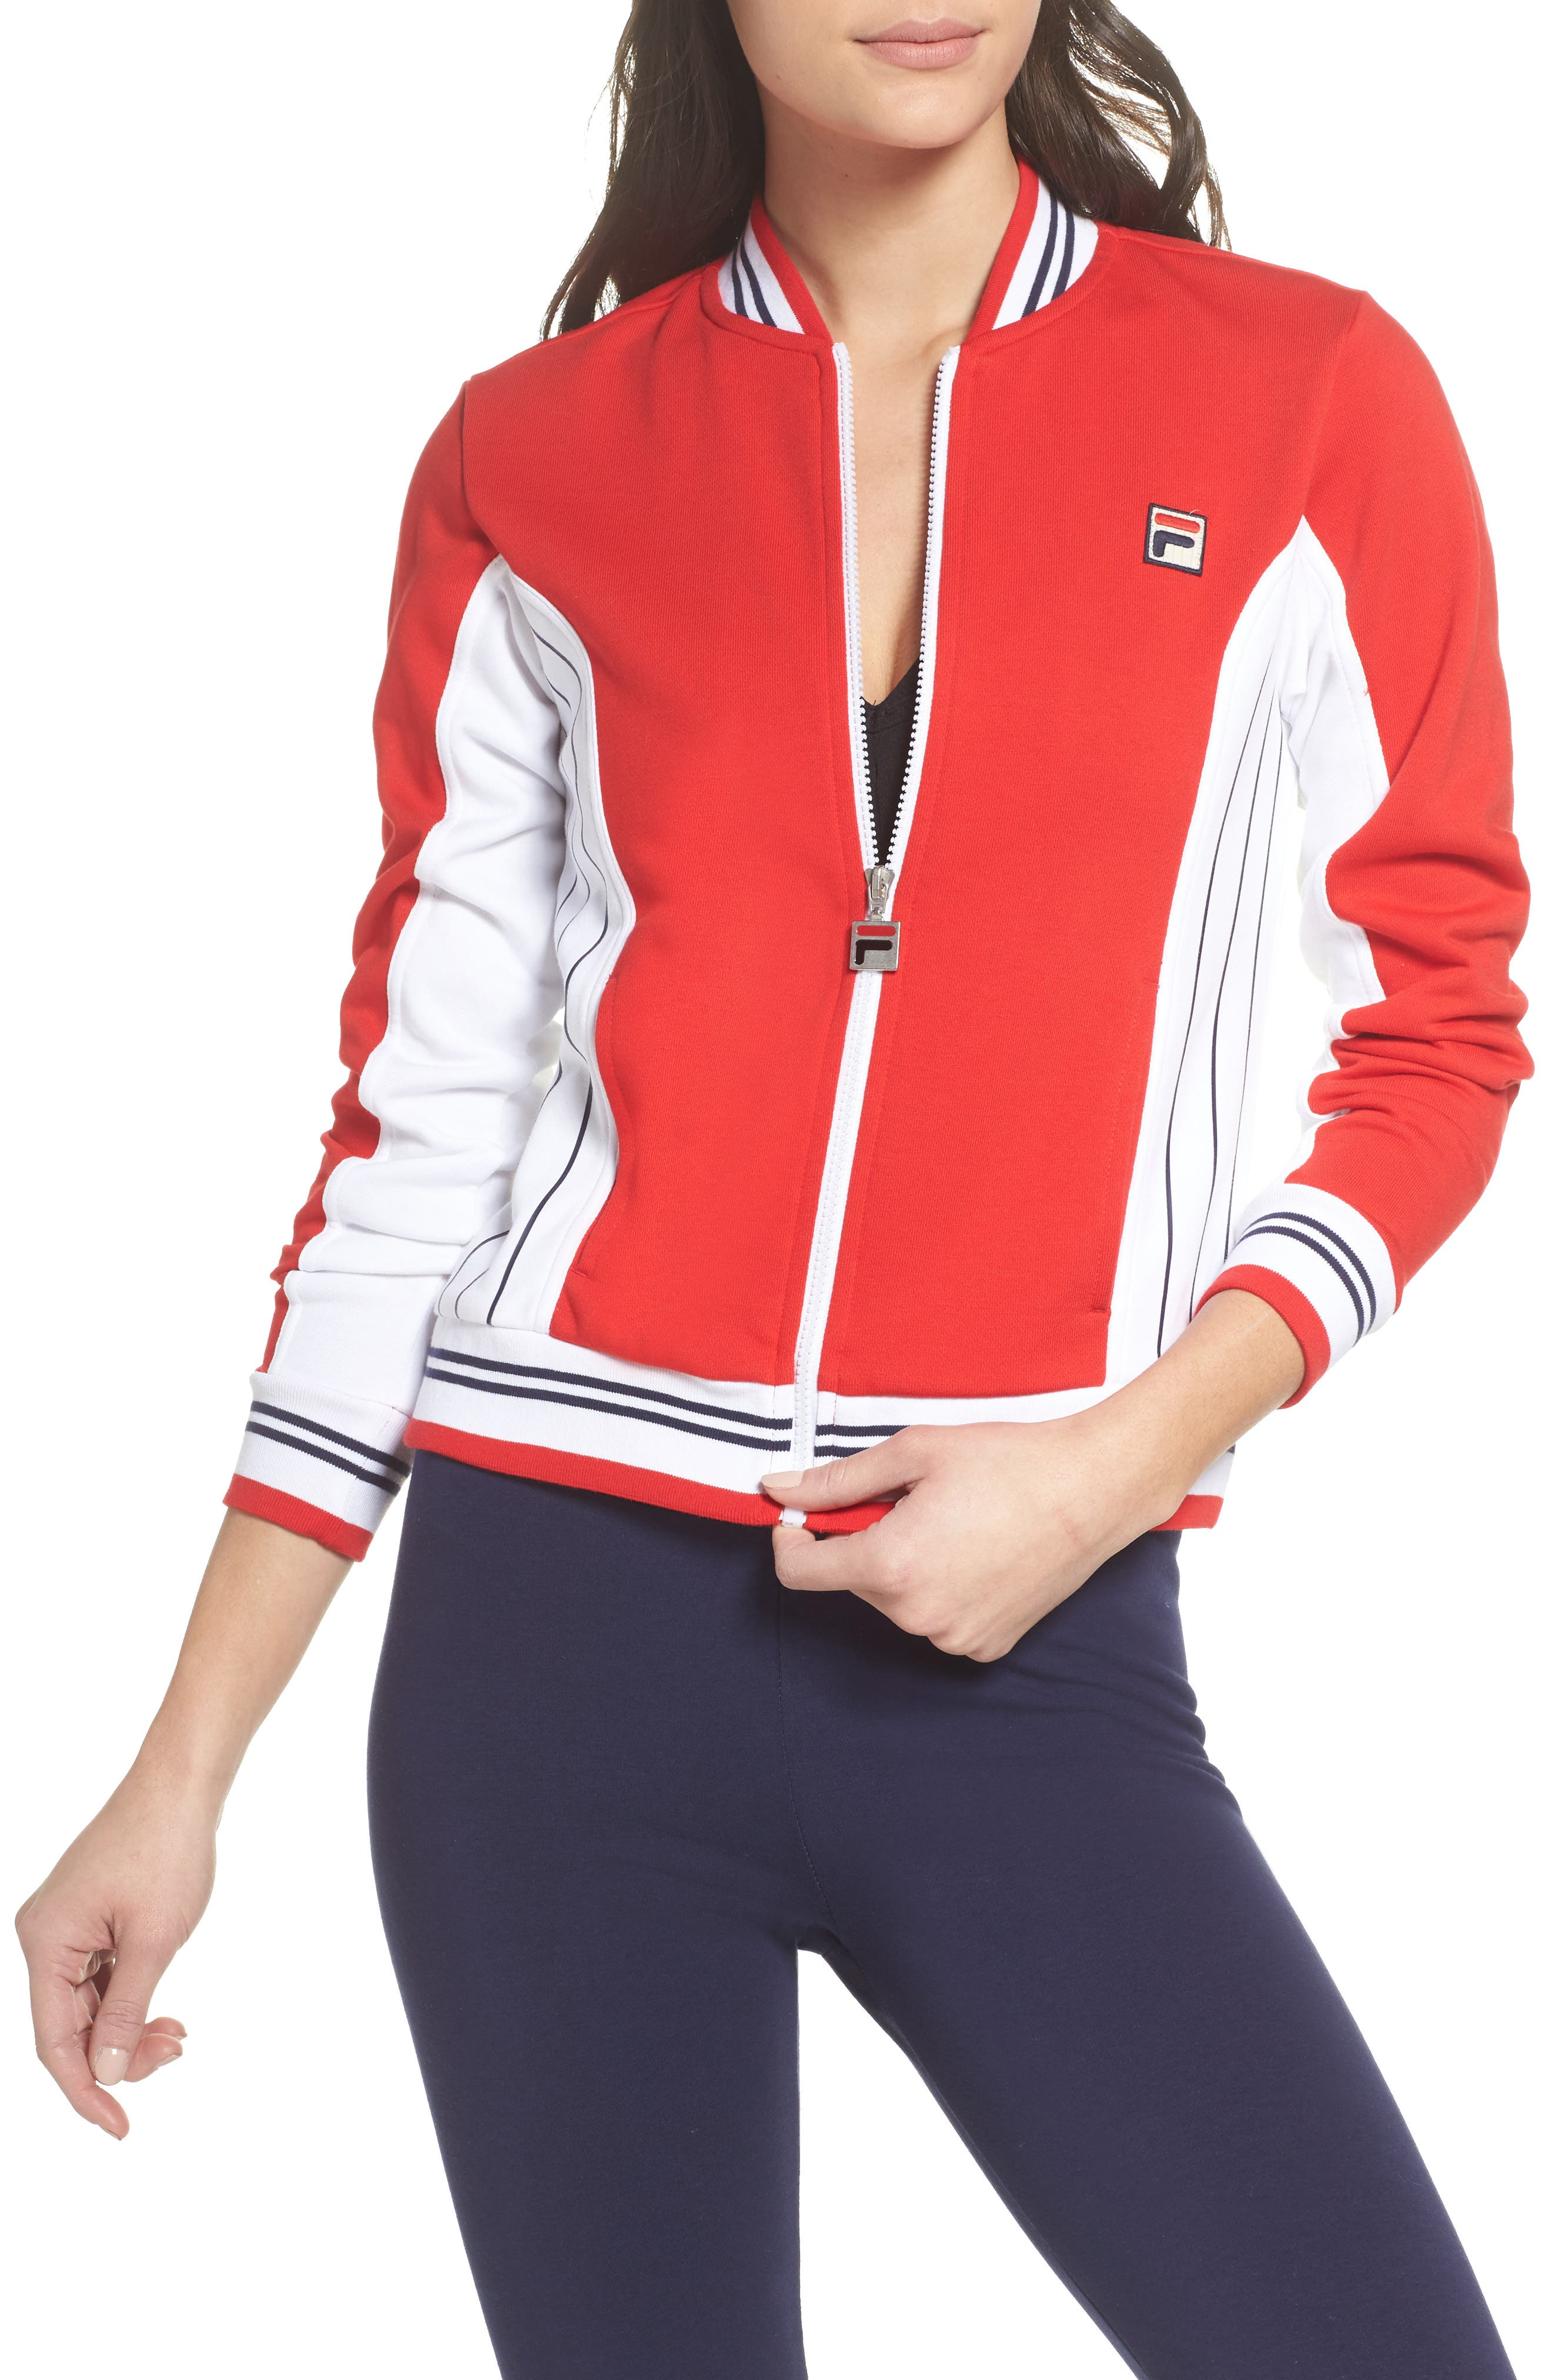 Main Image - FILA Settanta II Jacket